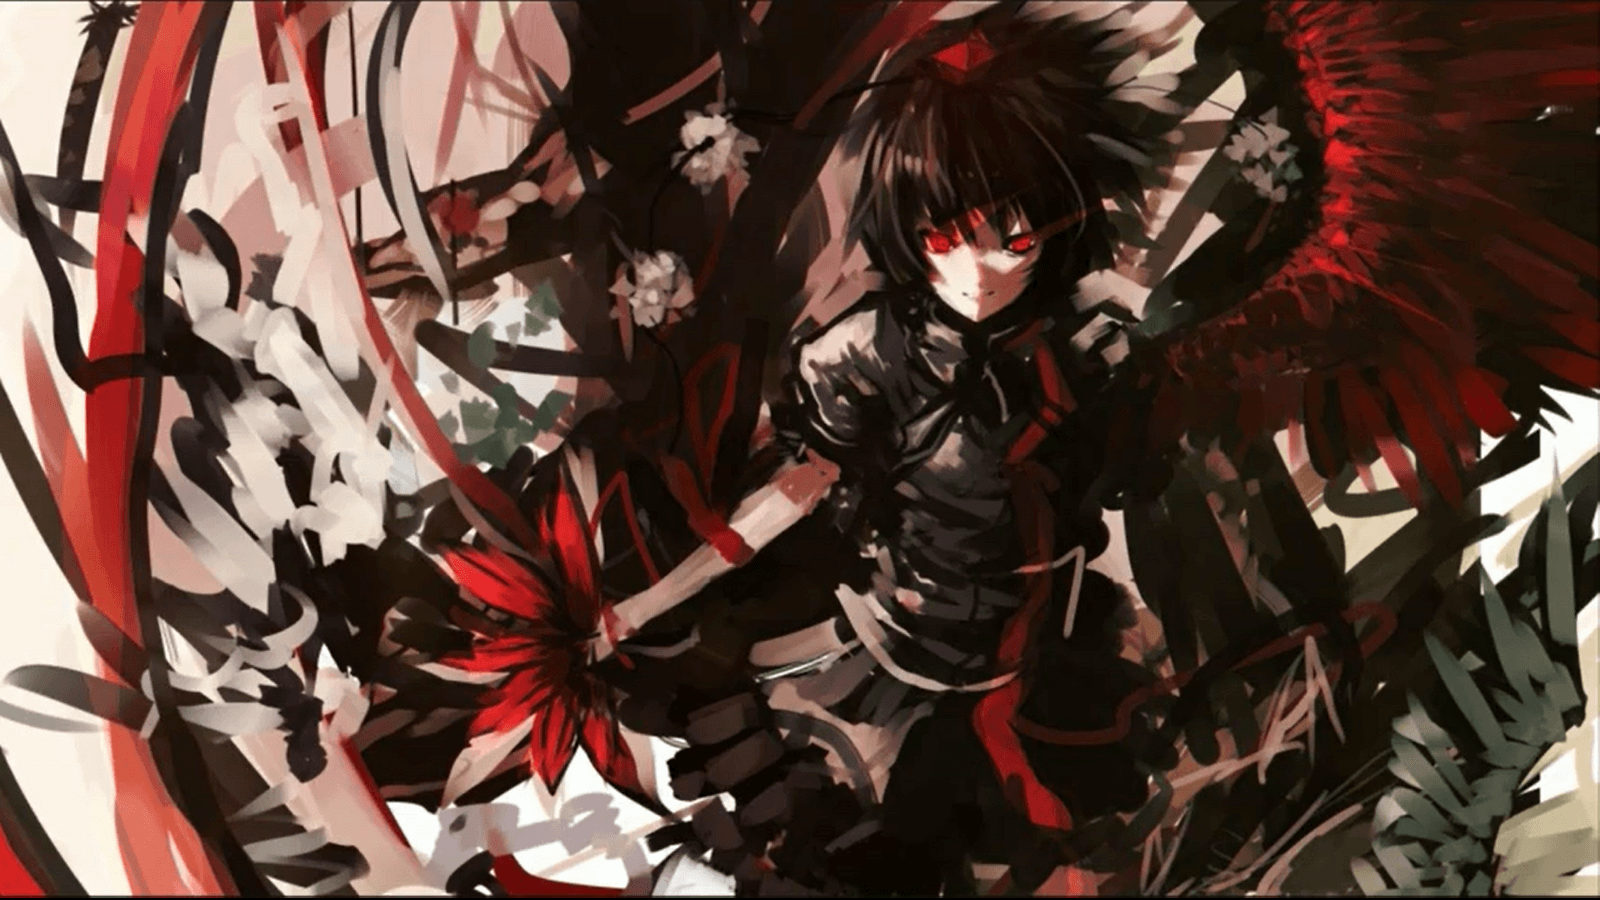 Evil Anime Girl Wallpapers - Top Free Evil Anime Girl Backgrounds